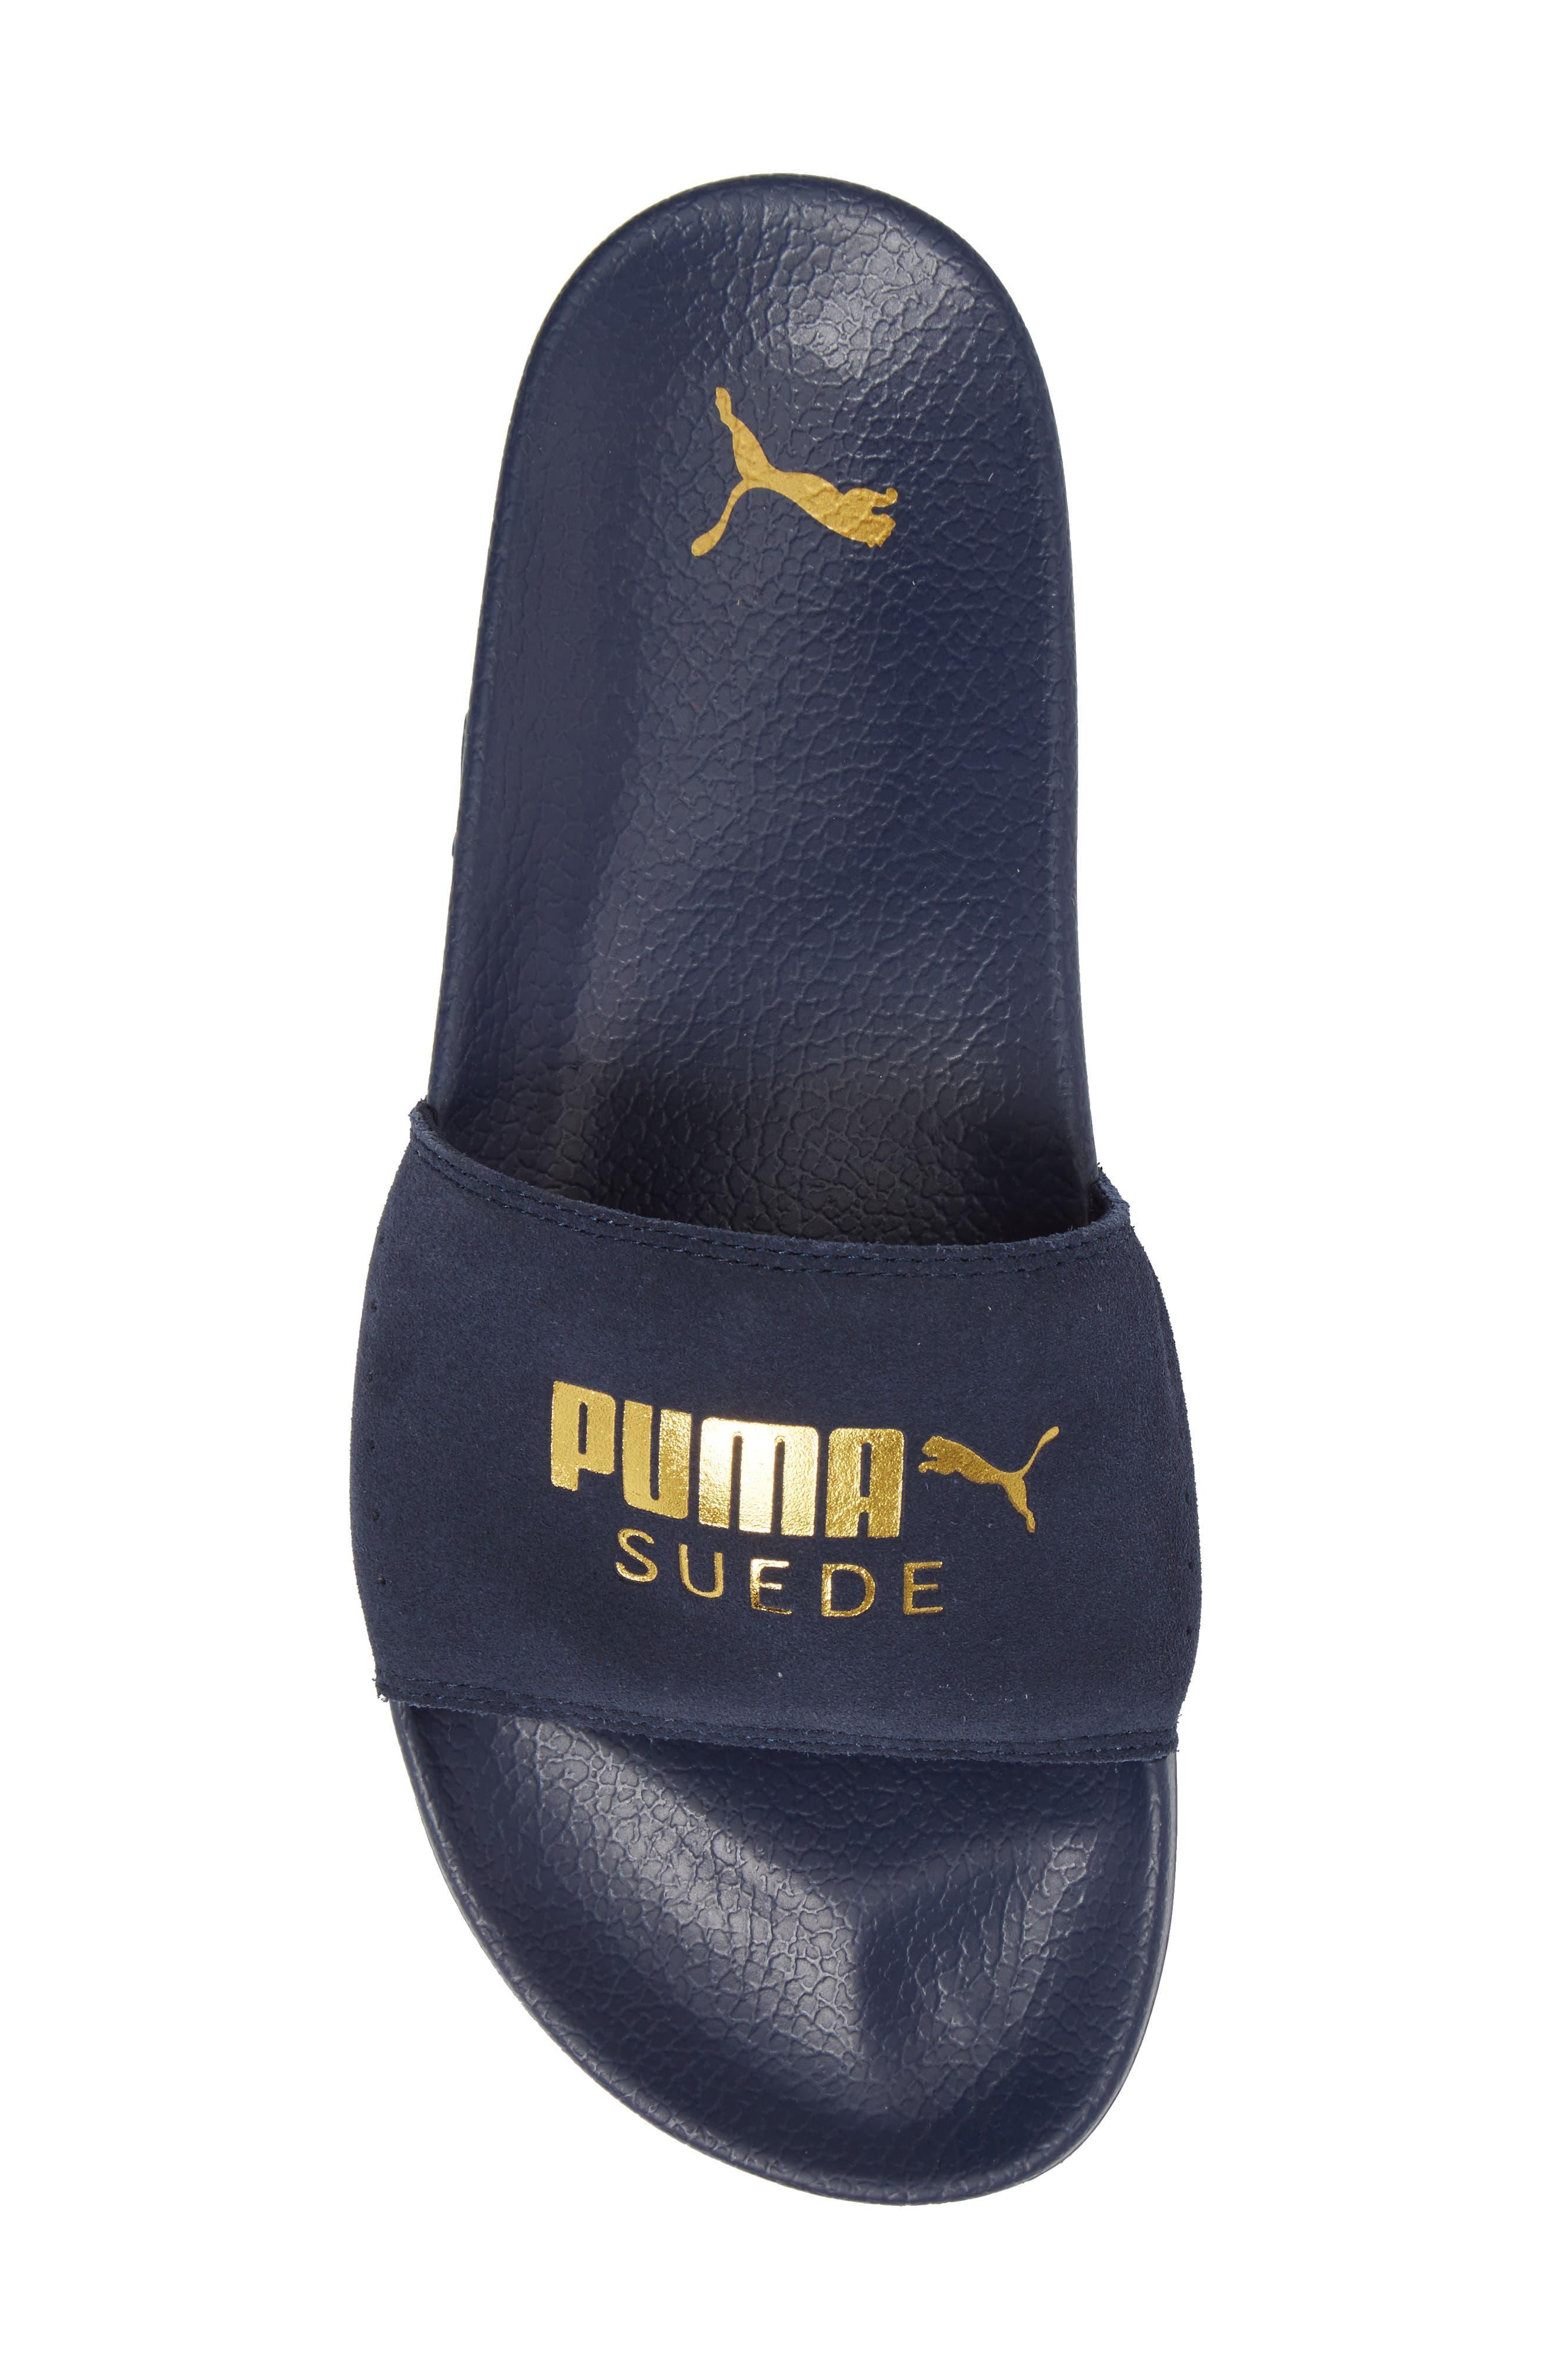 Leadcat Suede Slide Sandal,                             Alternate thumbnail 5, color,                             Peacoat/ Gold Leather/ Suede